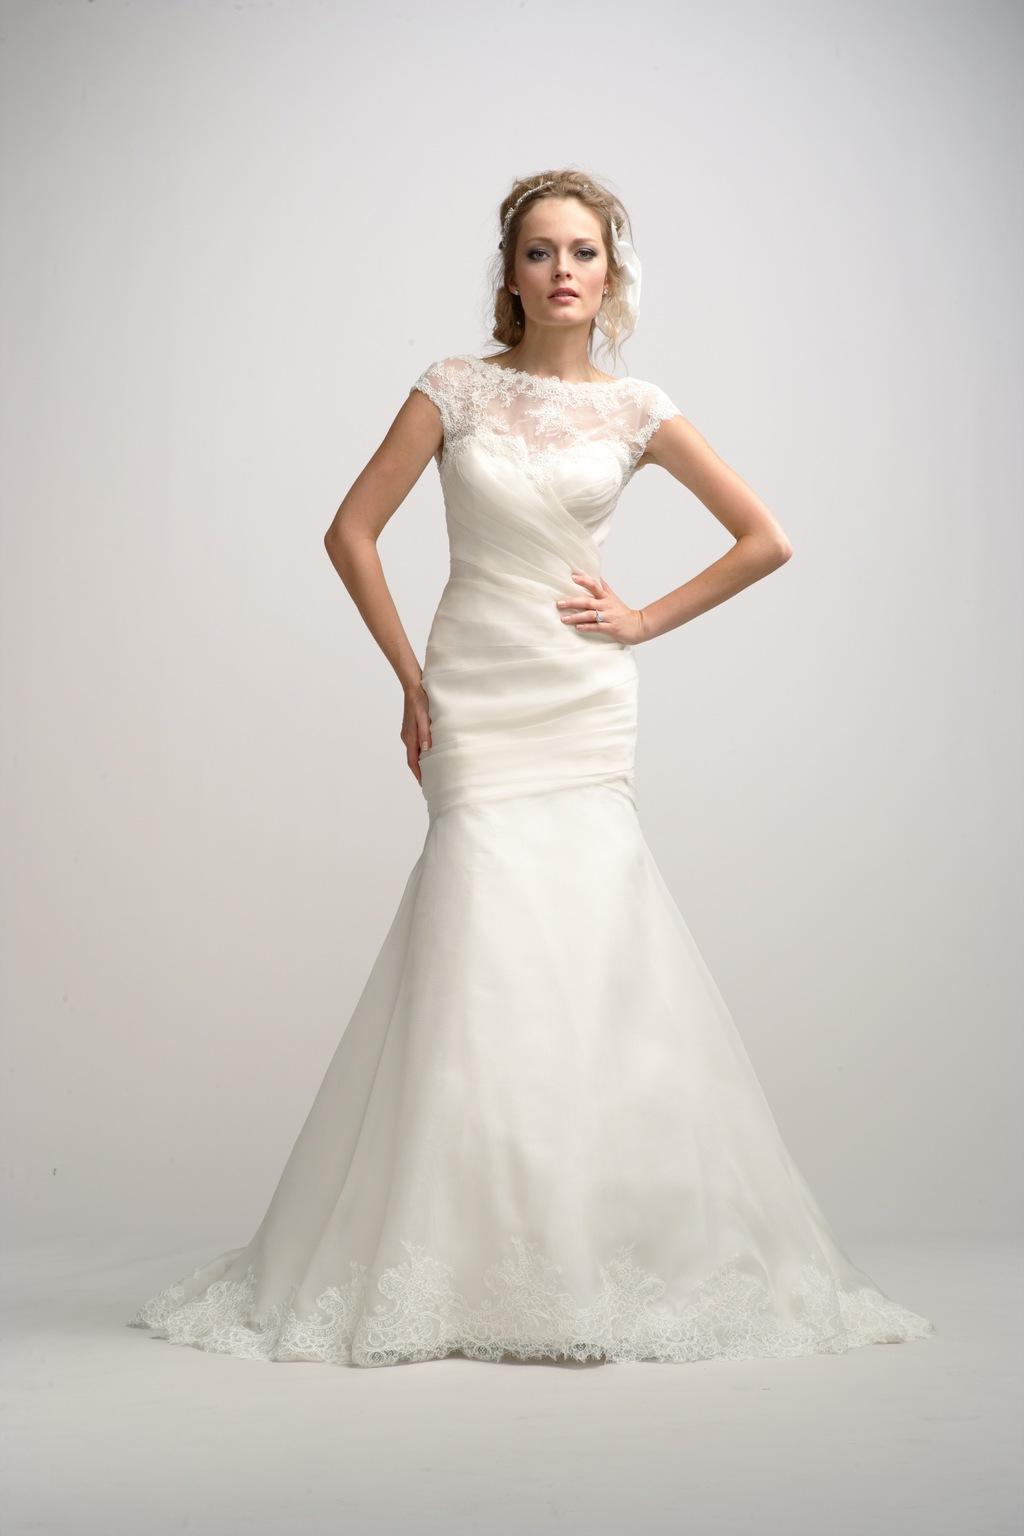 Fall-2012-wedding-dress-watters-bridal-gown-4.original.full